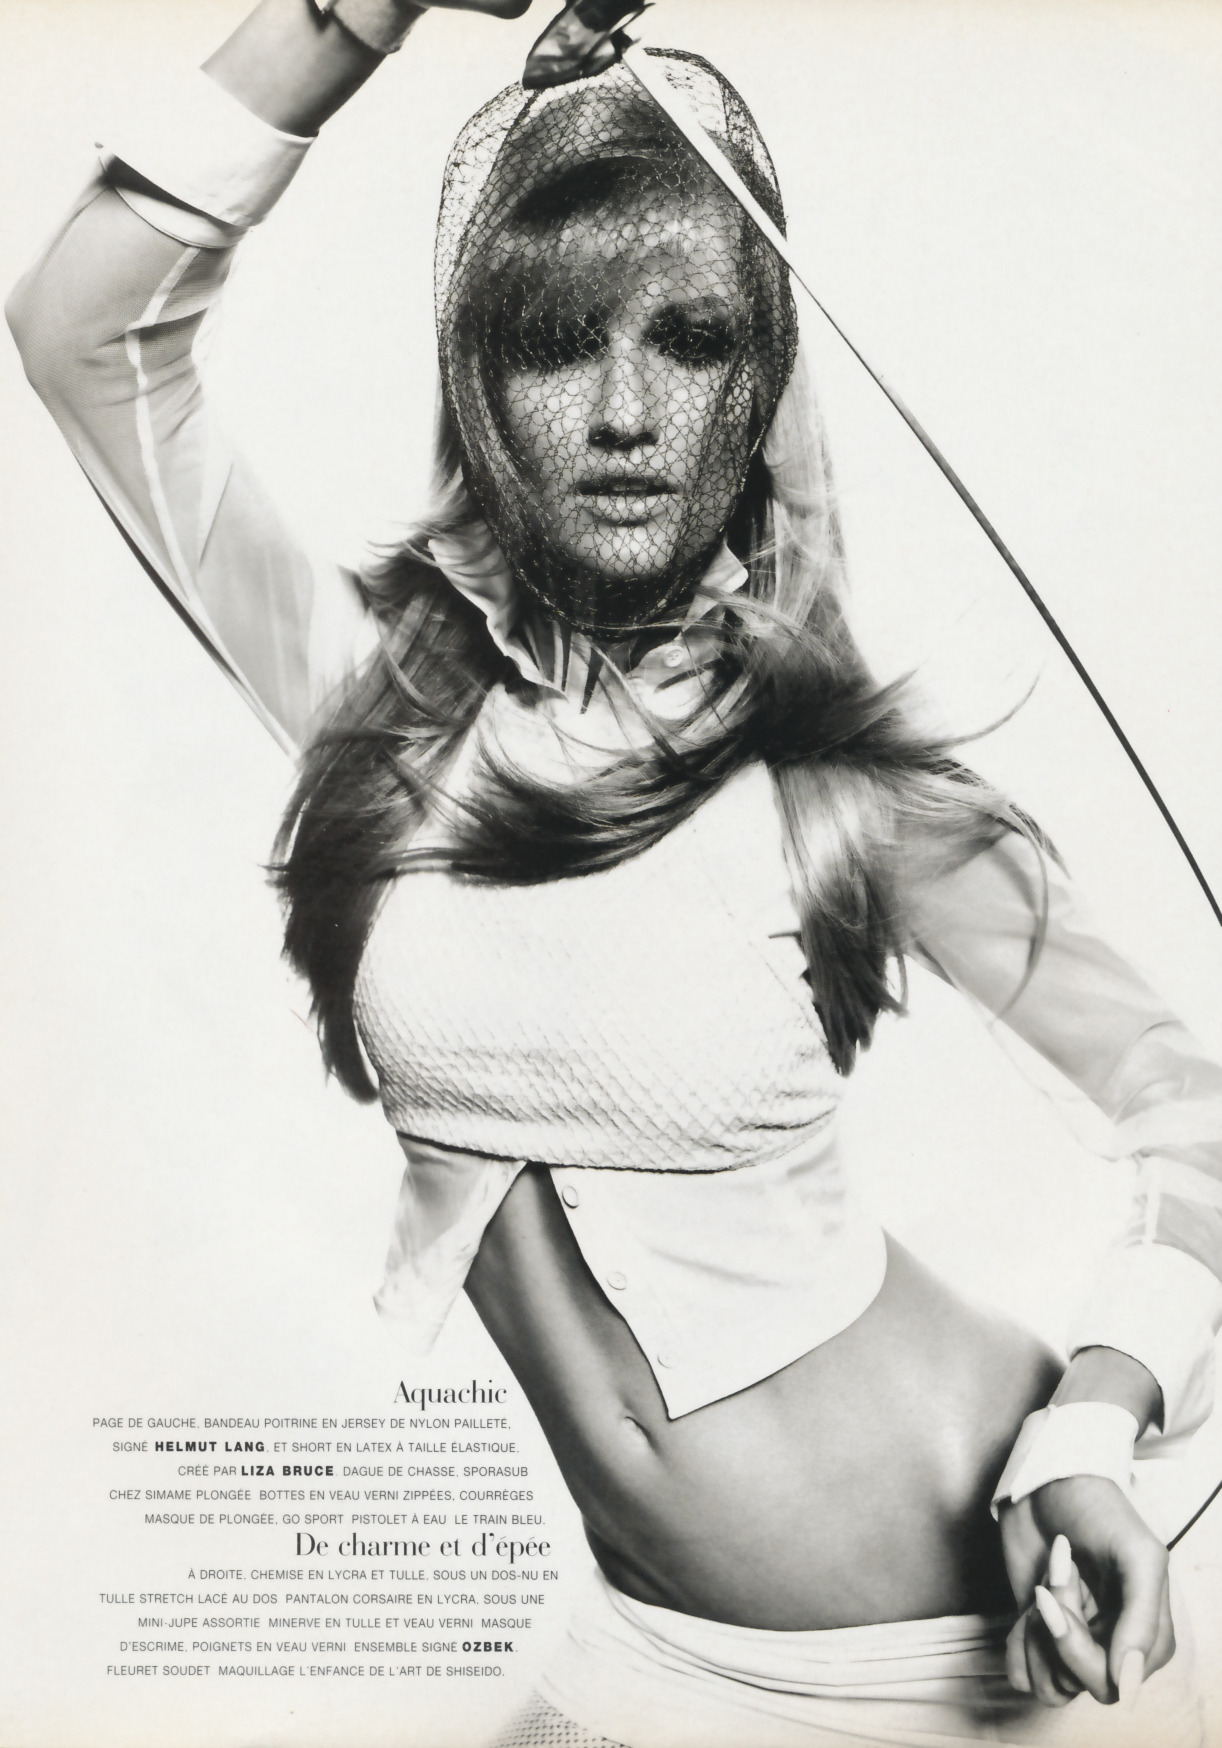 'Fencing Girl' Satoshi Saikusa